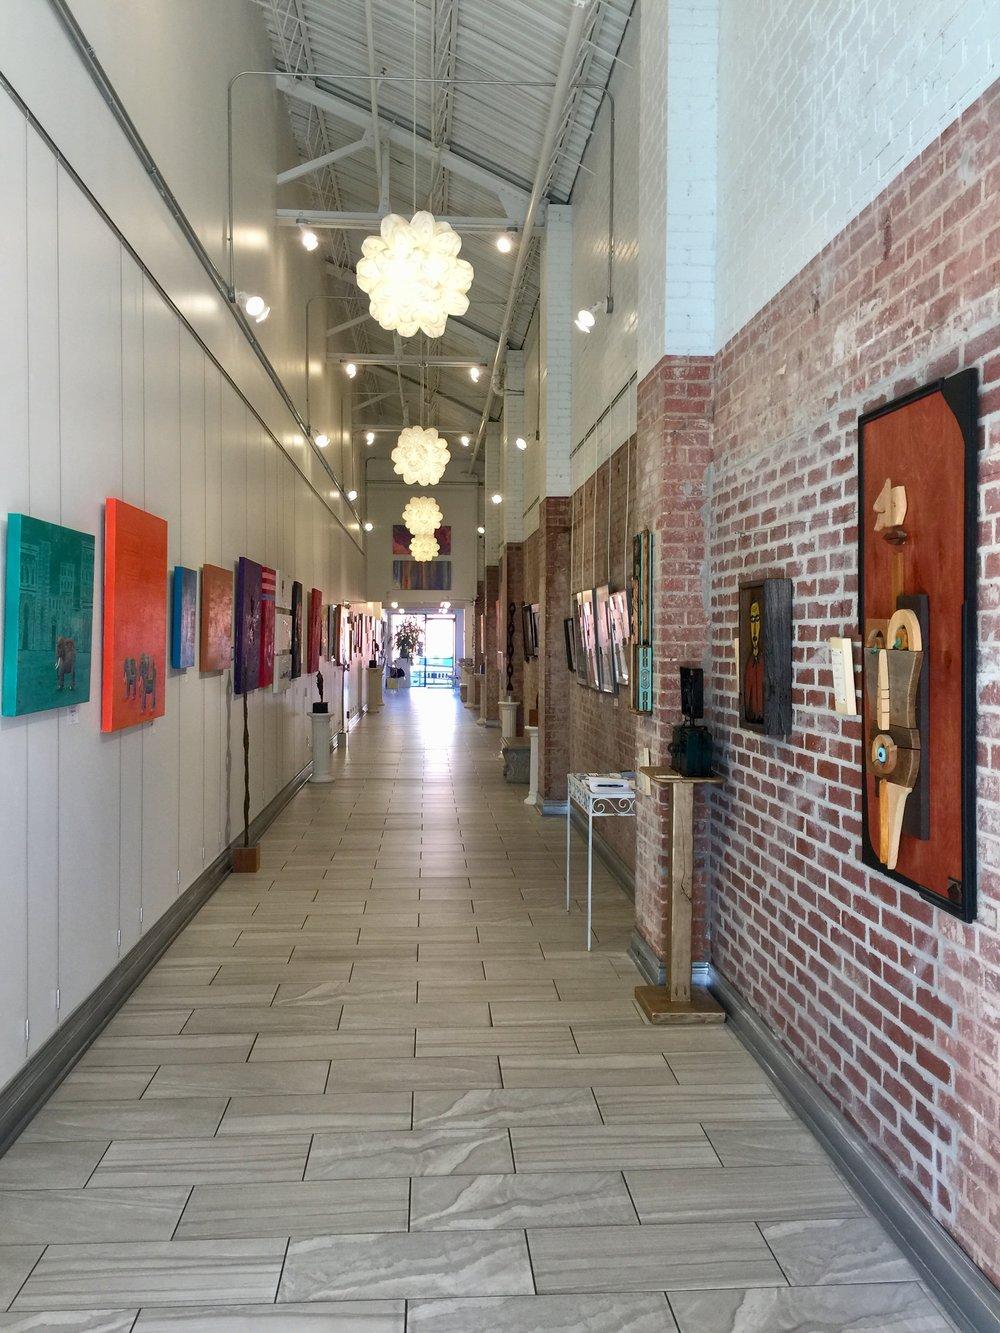 Hodge Podge, The Art Hall, Oklahoma City, Oct-Dec 2017